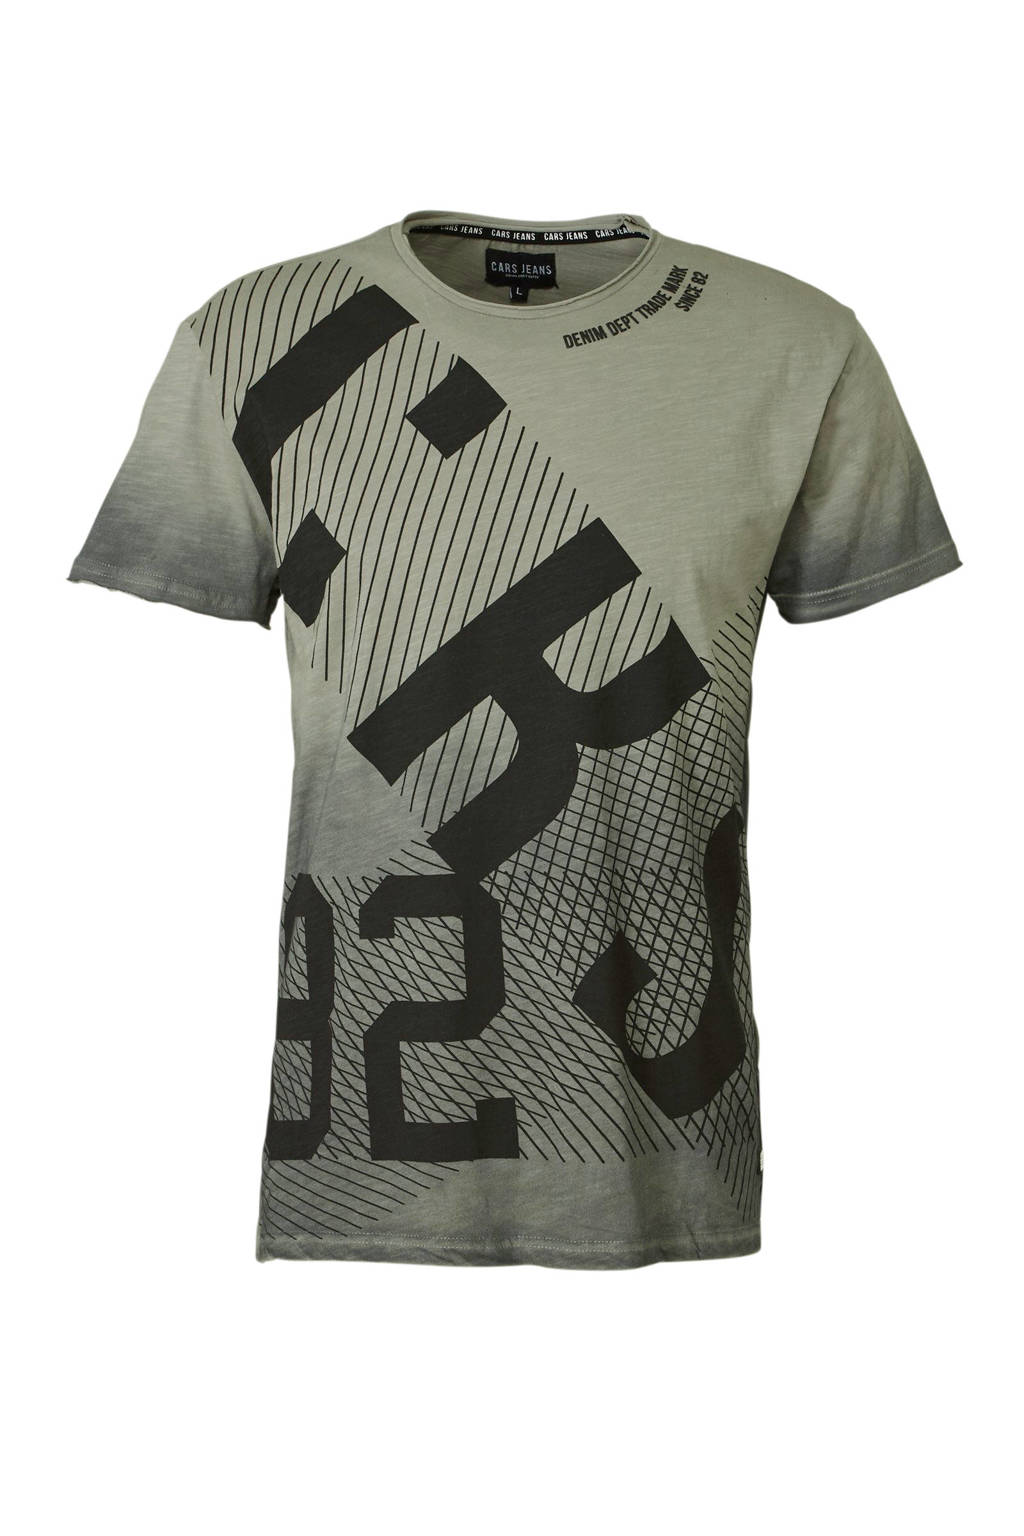 Cars T-shirt met print grijsgroen, Grijsgroen